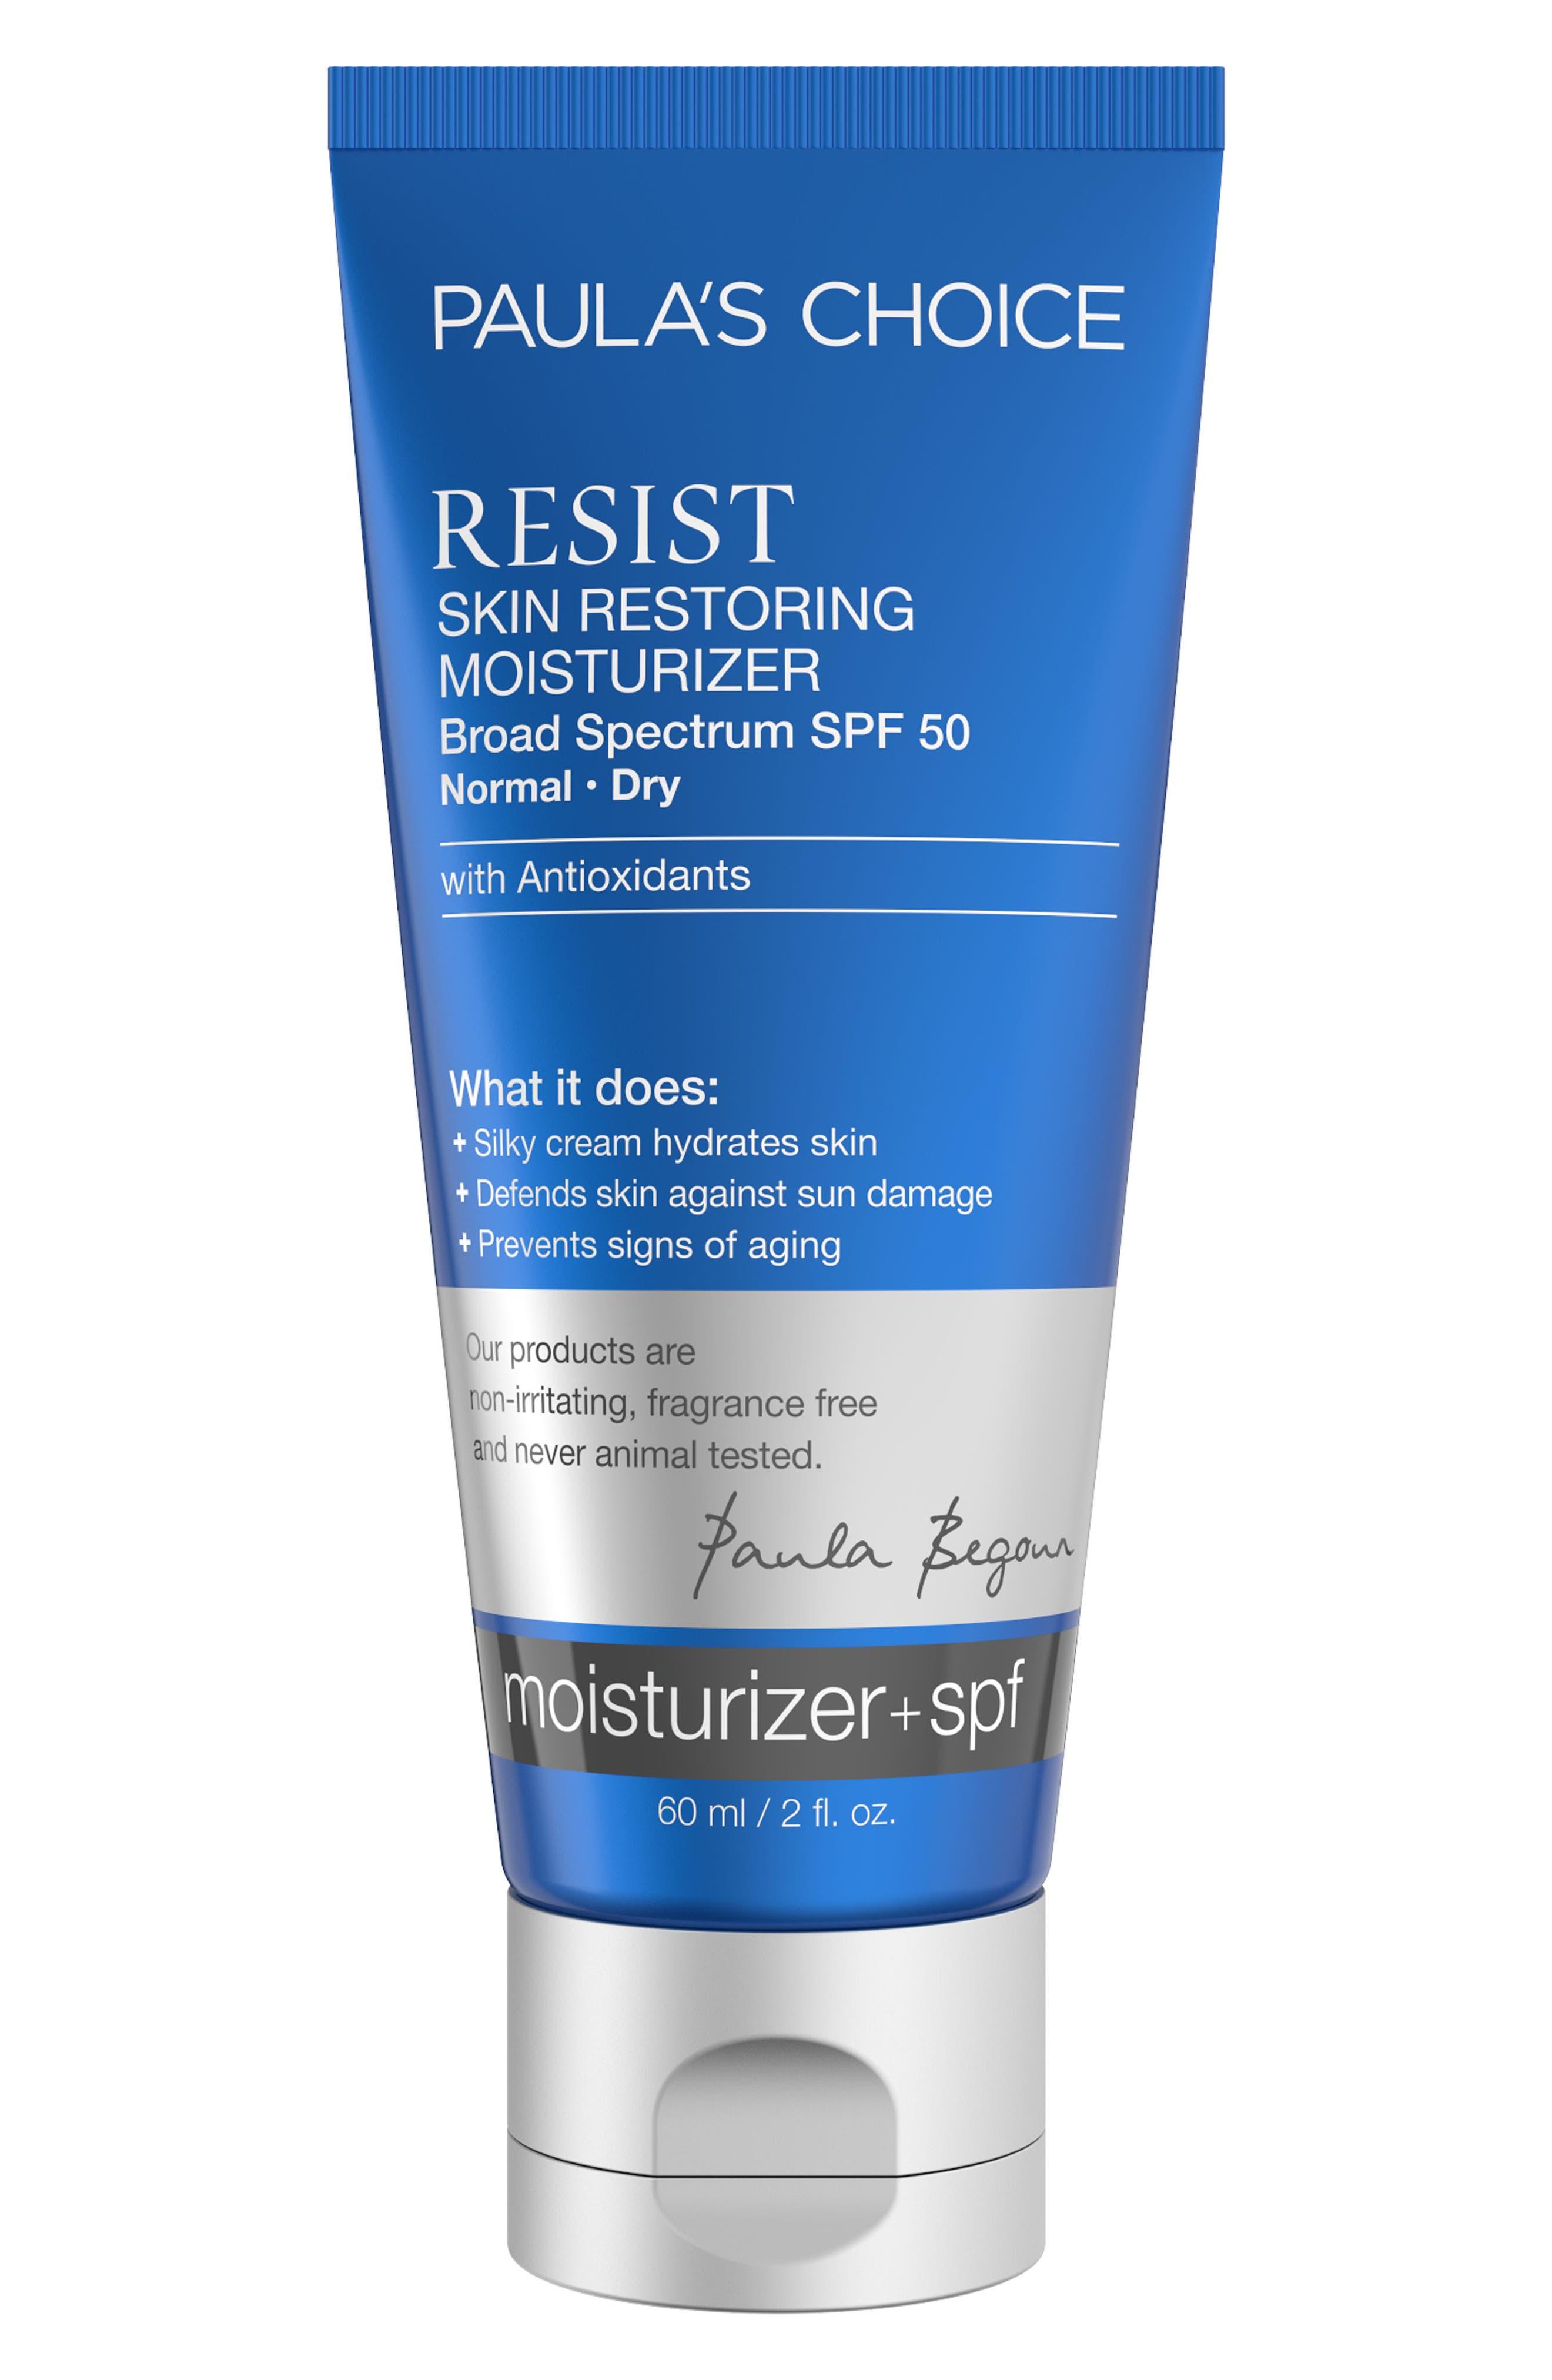 Paula's Choice Resist Skin Restoring Moisturizing SPF 50